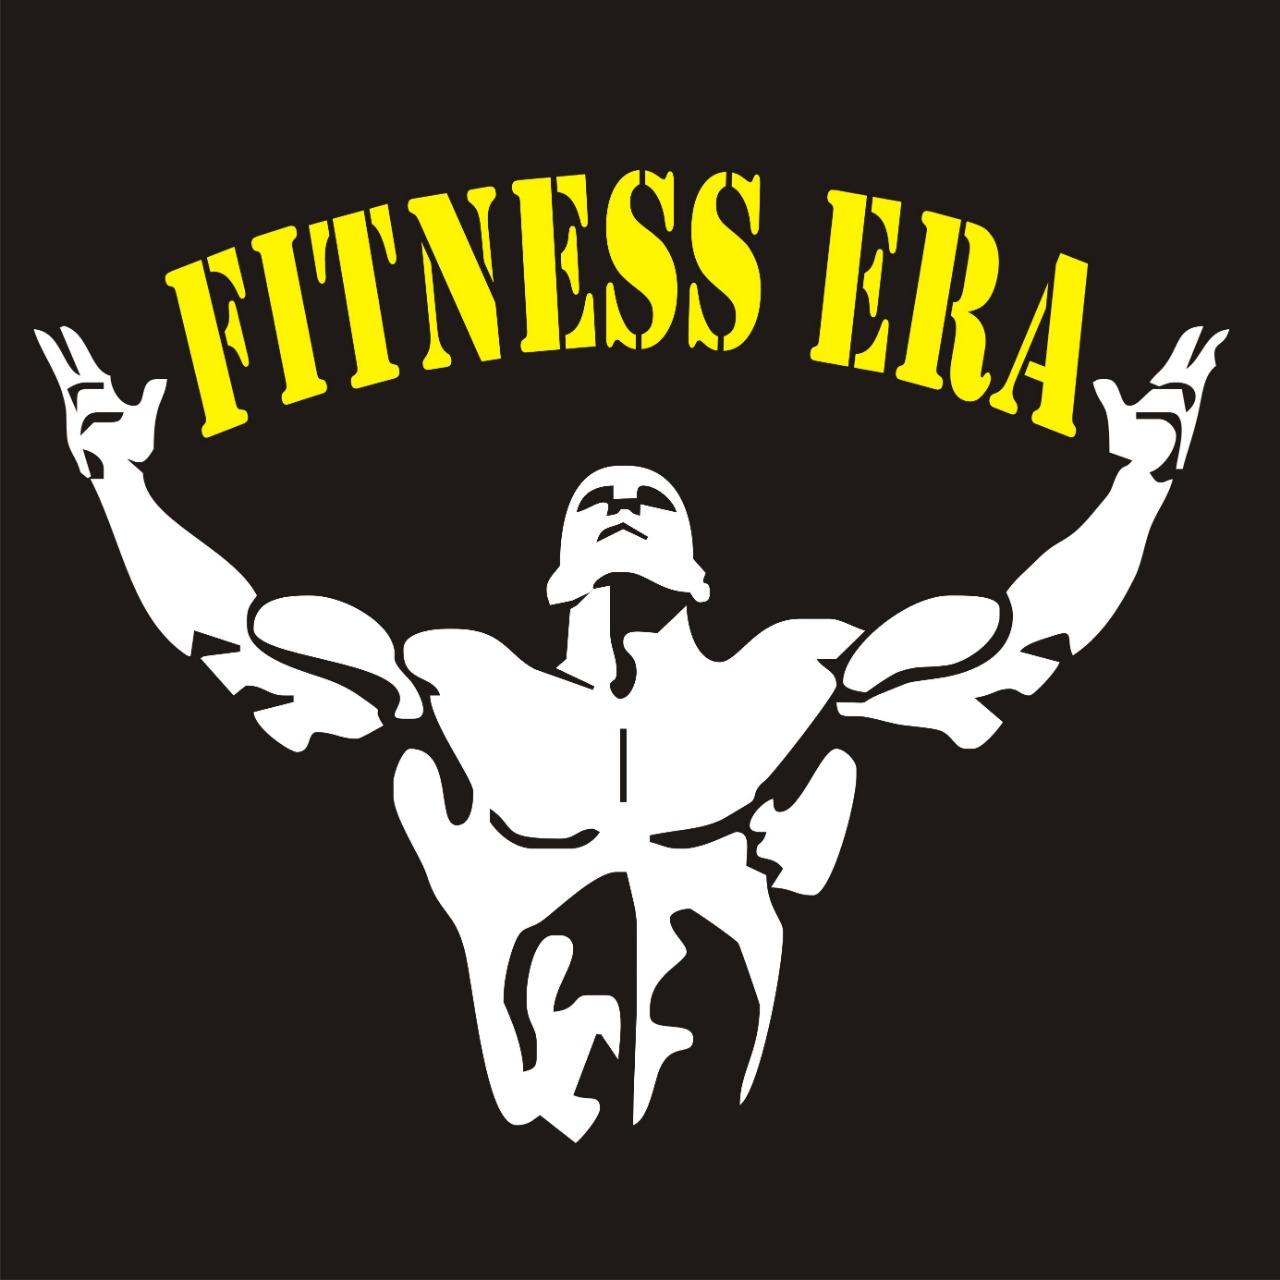 Fitness Era